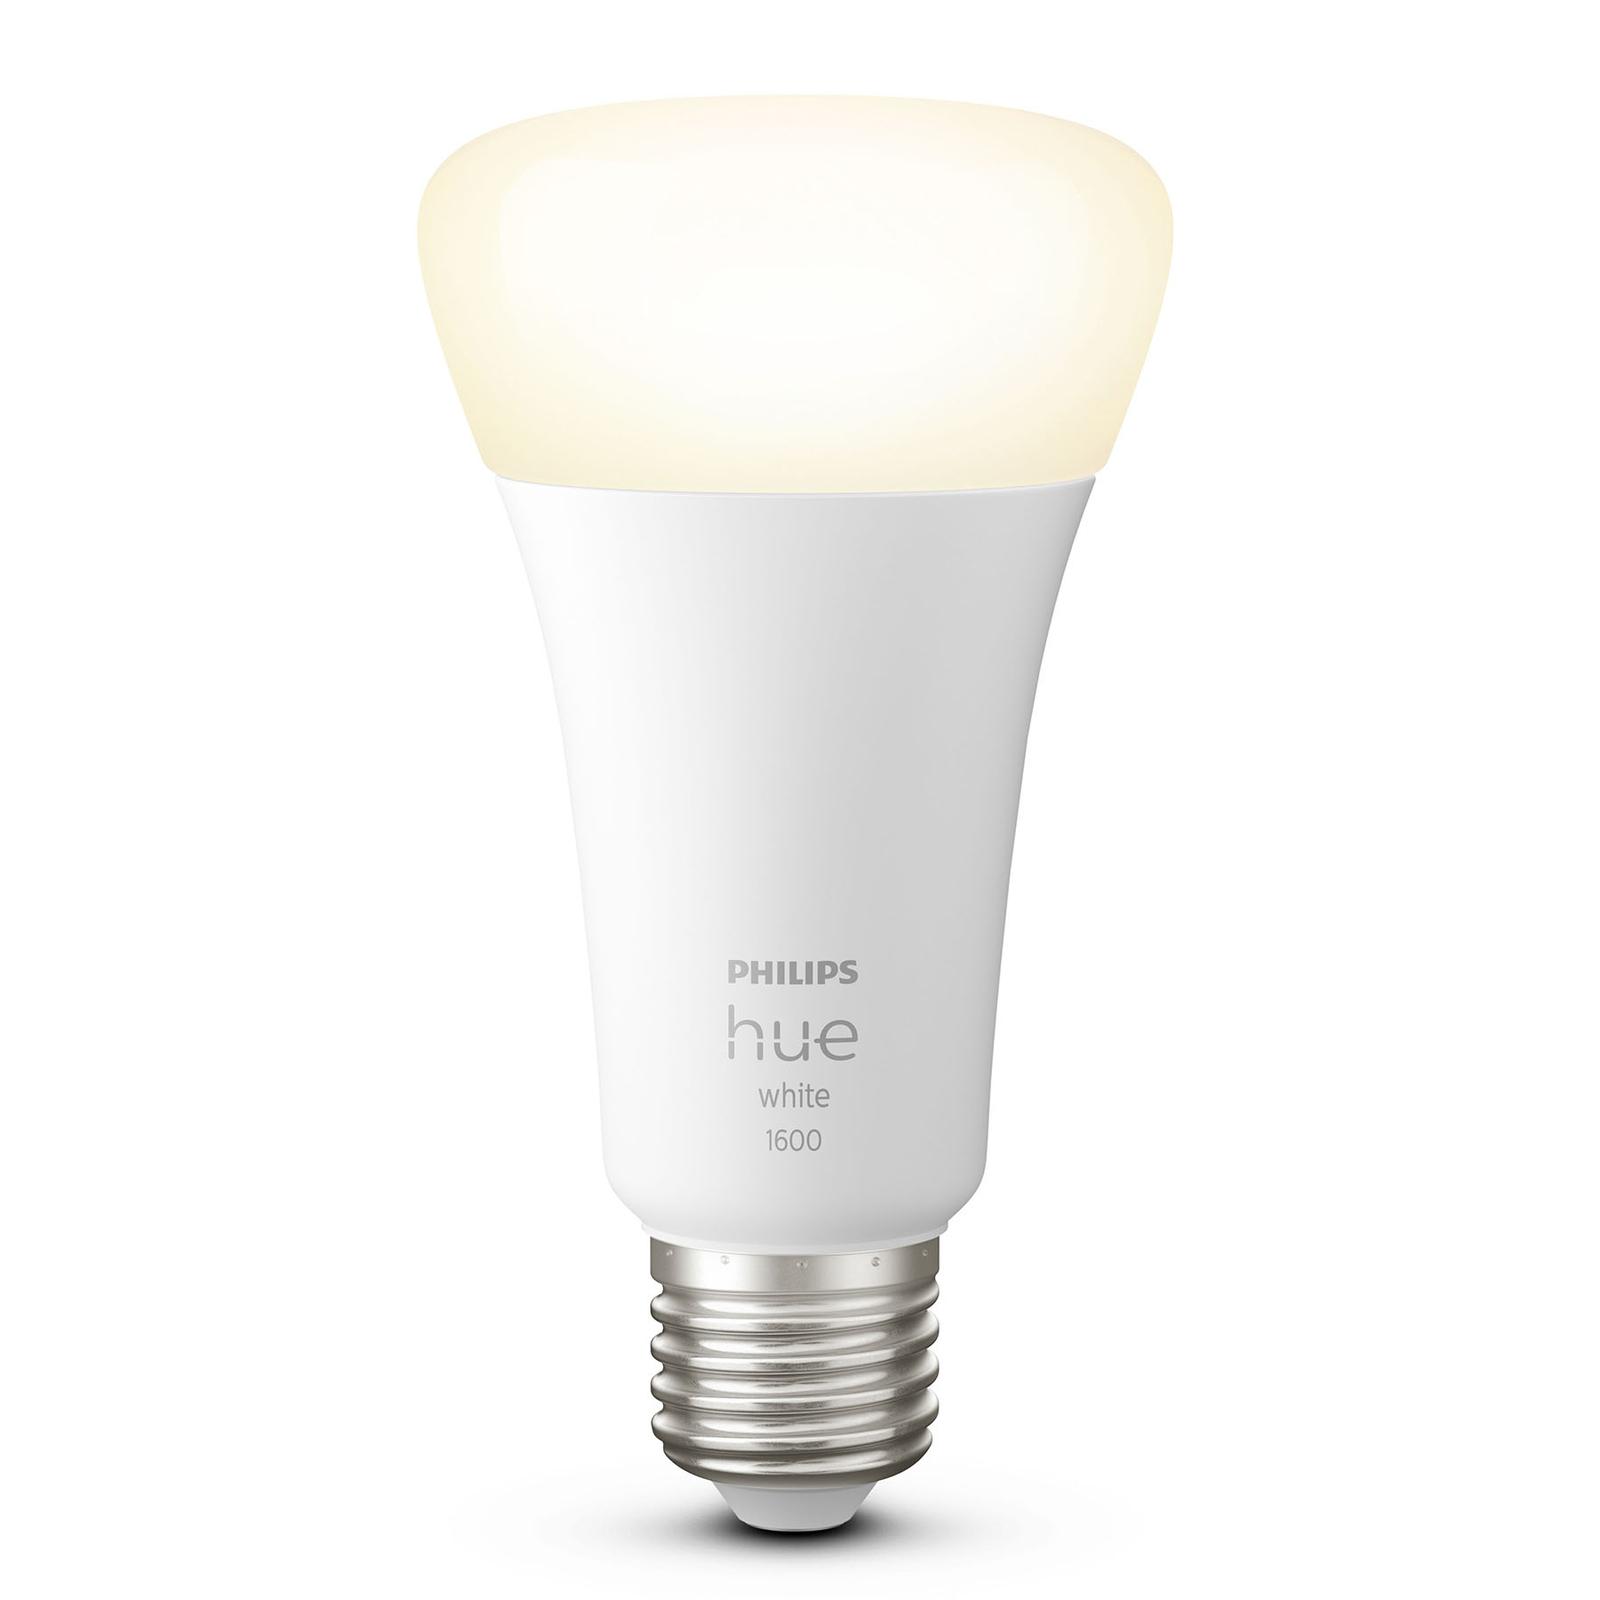 welche lampen sind zu philips hue kompatibel